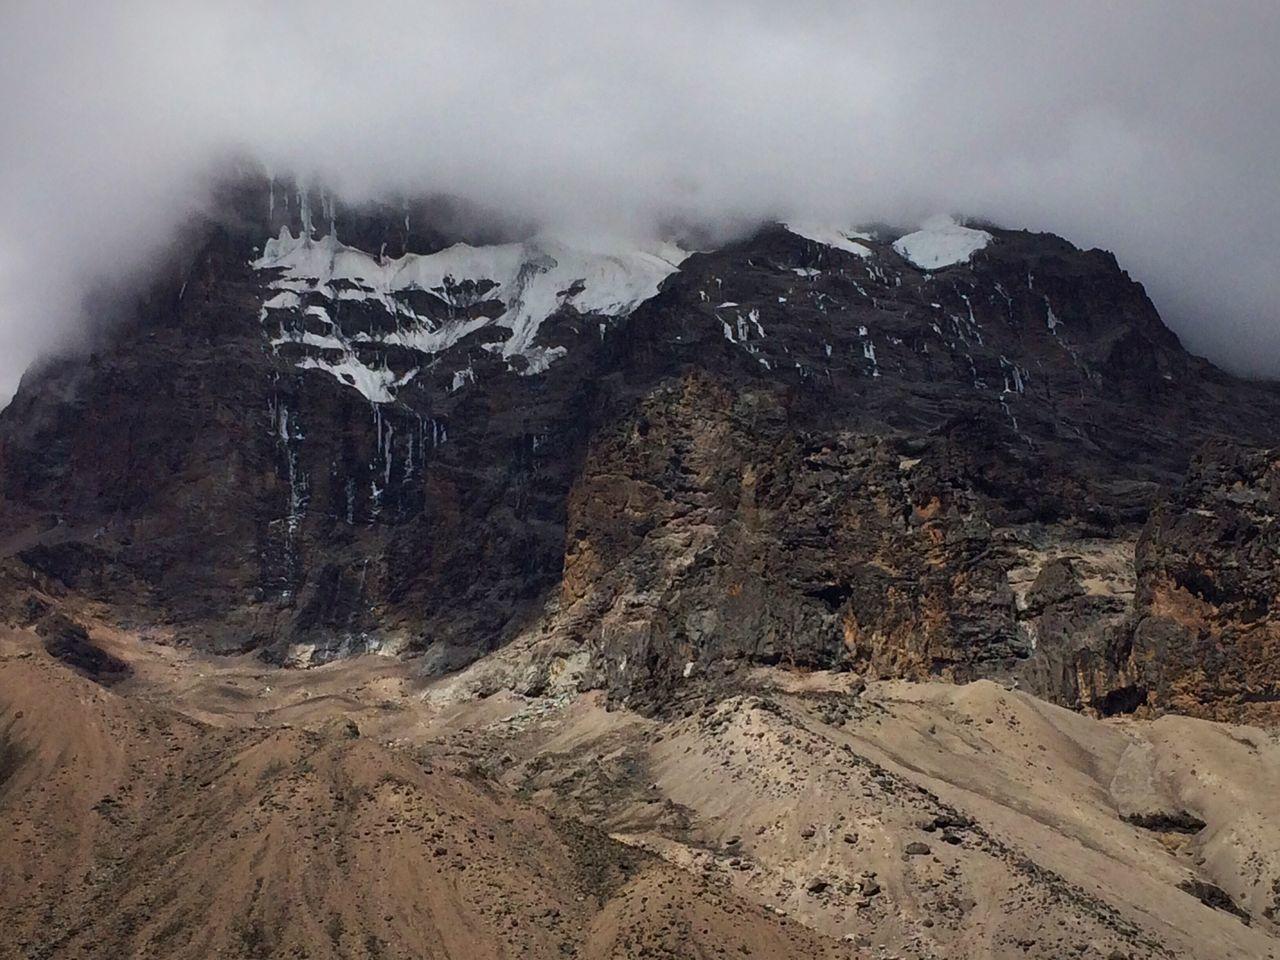 MountKilimanjaro Kilimanjaro Tanzania Tanzanianationalparks Cloud Mountainphotography Amazing View Gadventurestour Adventure Trek Trekking Outdoor Photography Amazing Mountain Photography